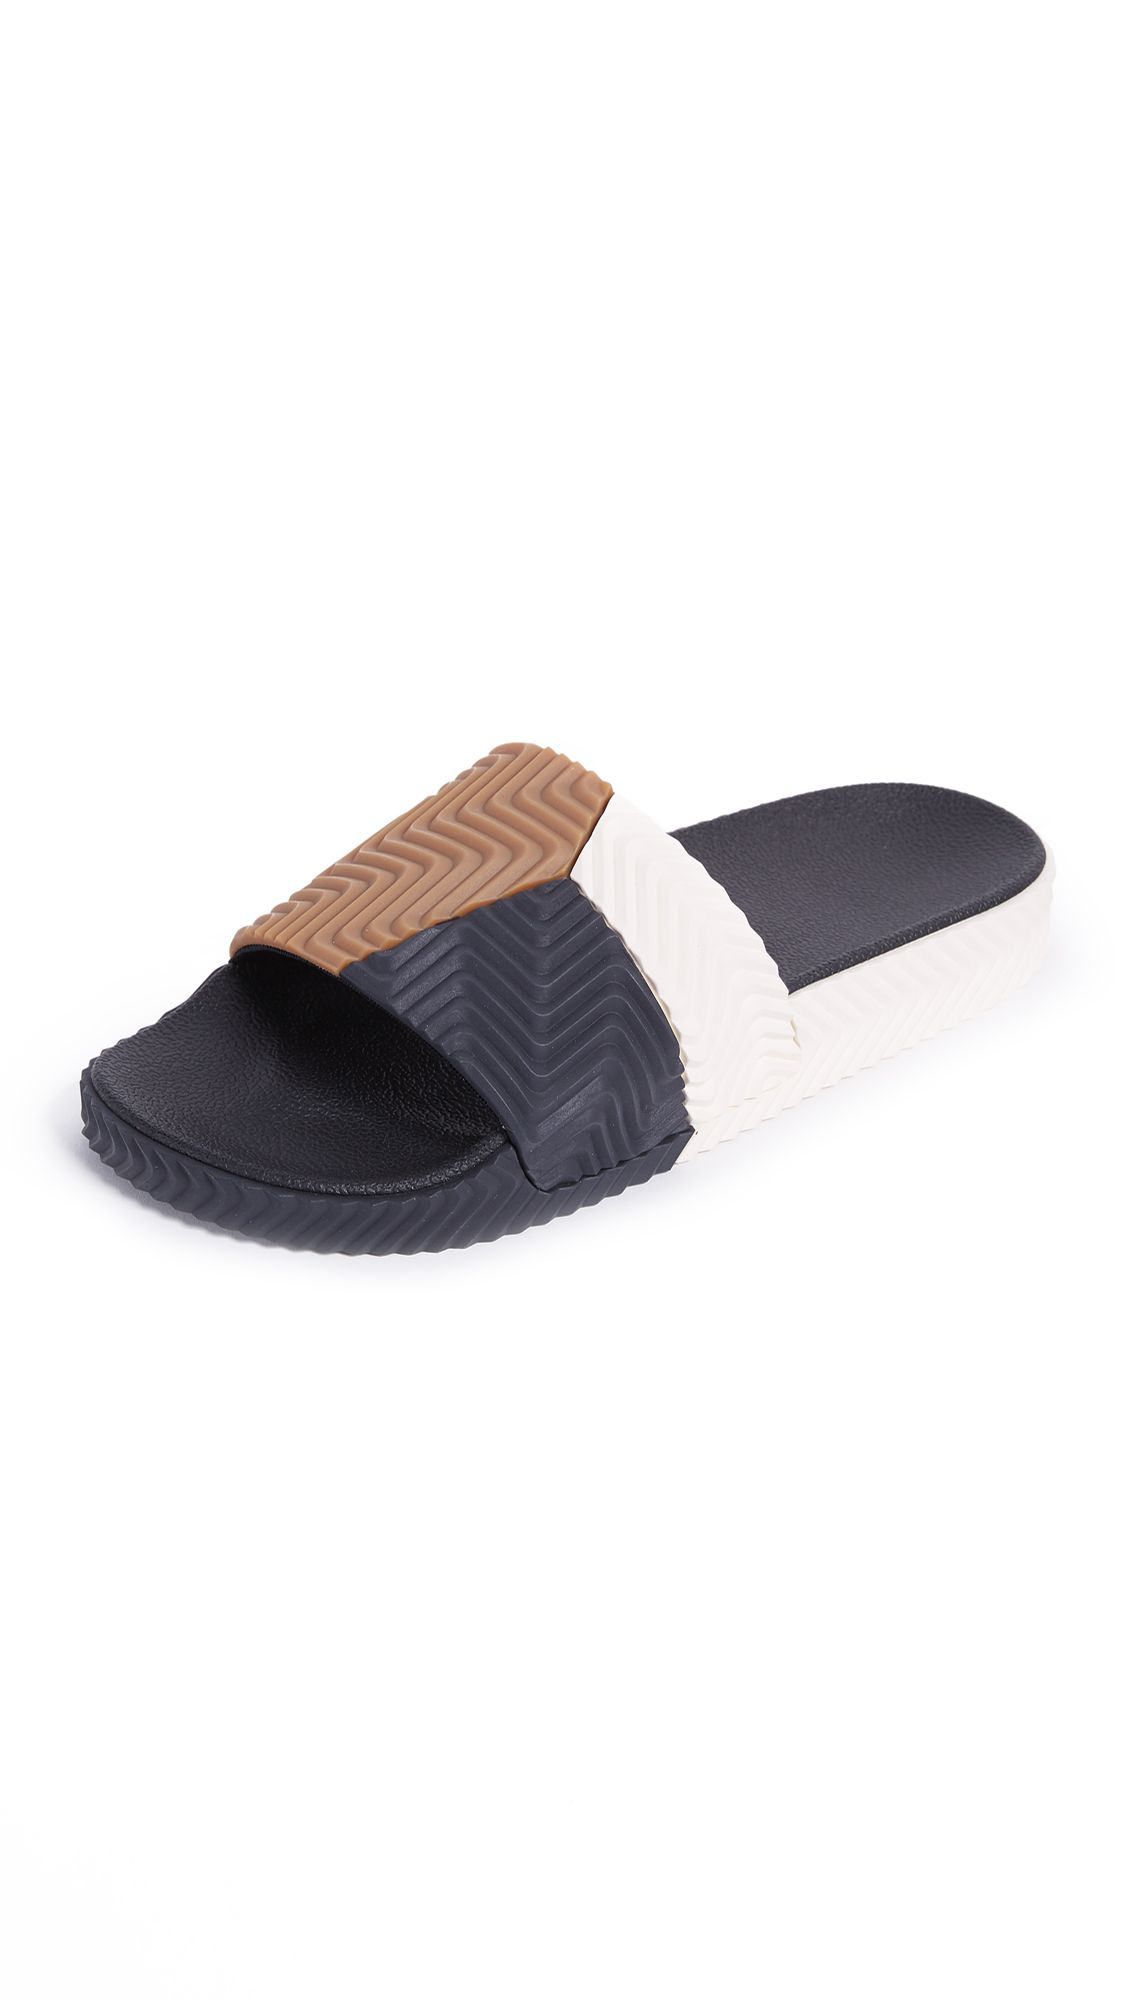 bc9e1f9553f4c ADIDAS ORIGINALS BY ALEXANDER WANG AW ADILETTE SANDALS.   adidasoriginalsbyalexanderwang  shoes